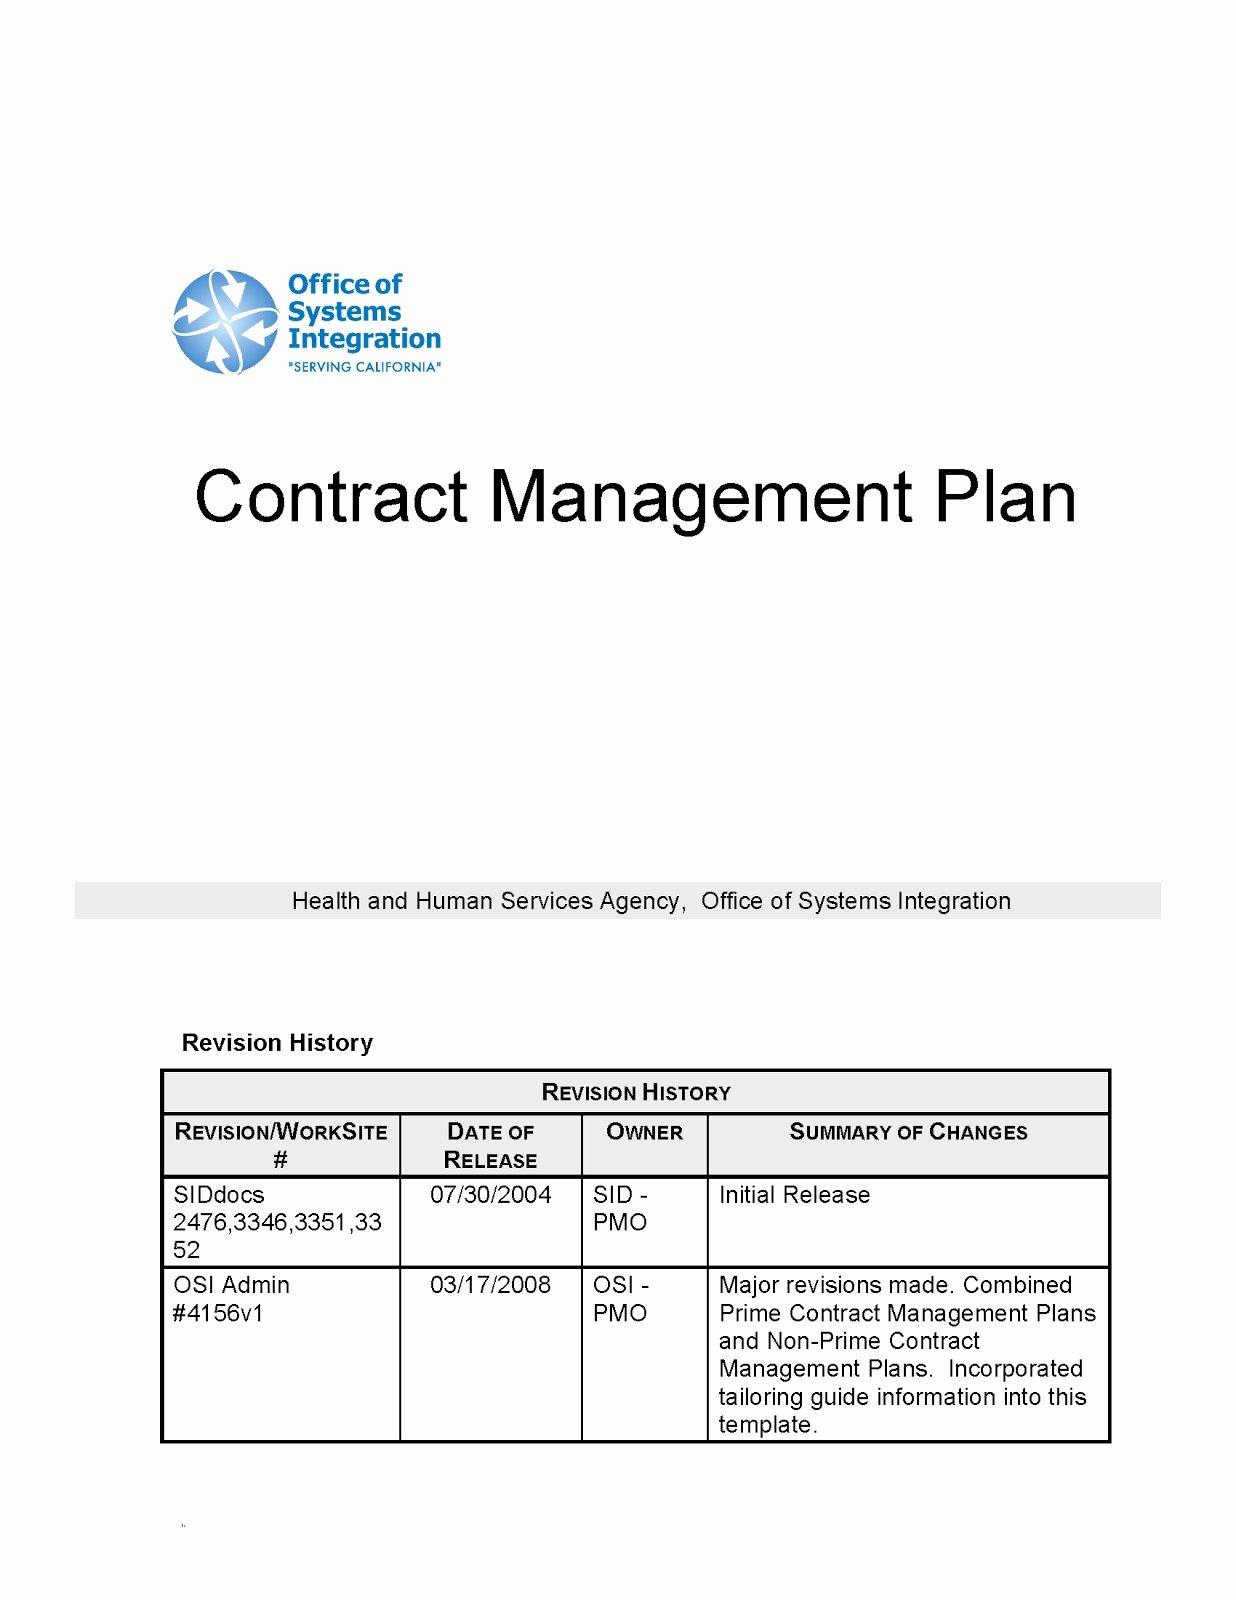 Territory Management Plan Template Elegant Territory Management Plan Template New Service Report